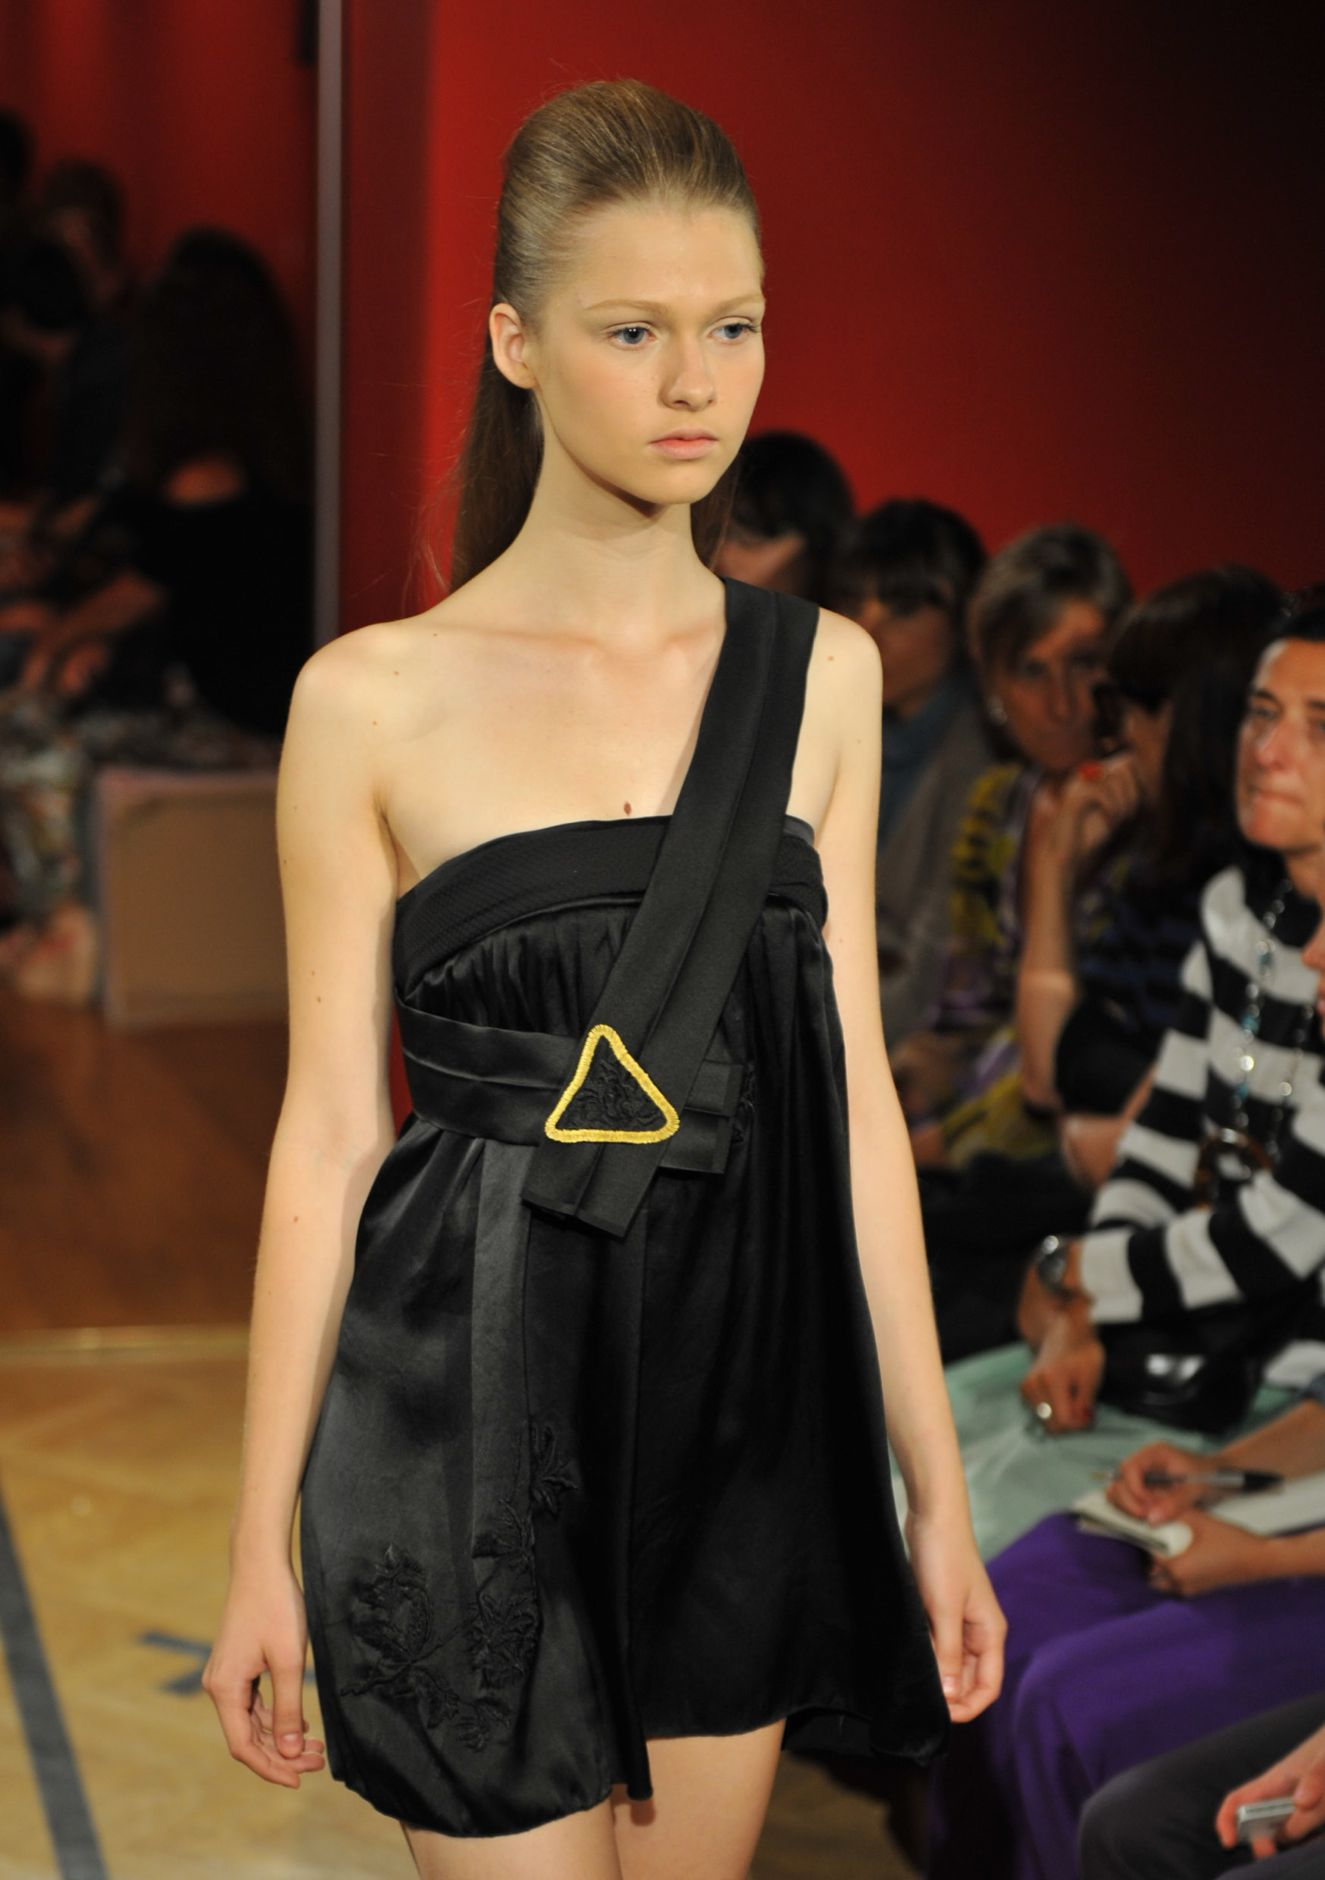 Andrea Incontri Women's Collection 2013 Milan Fashion Week